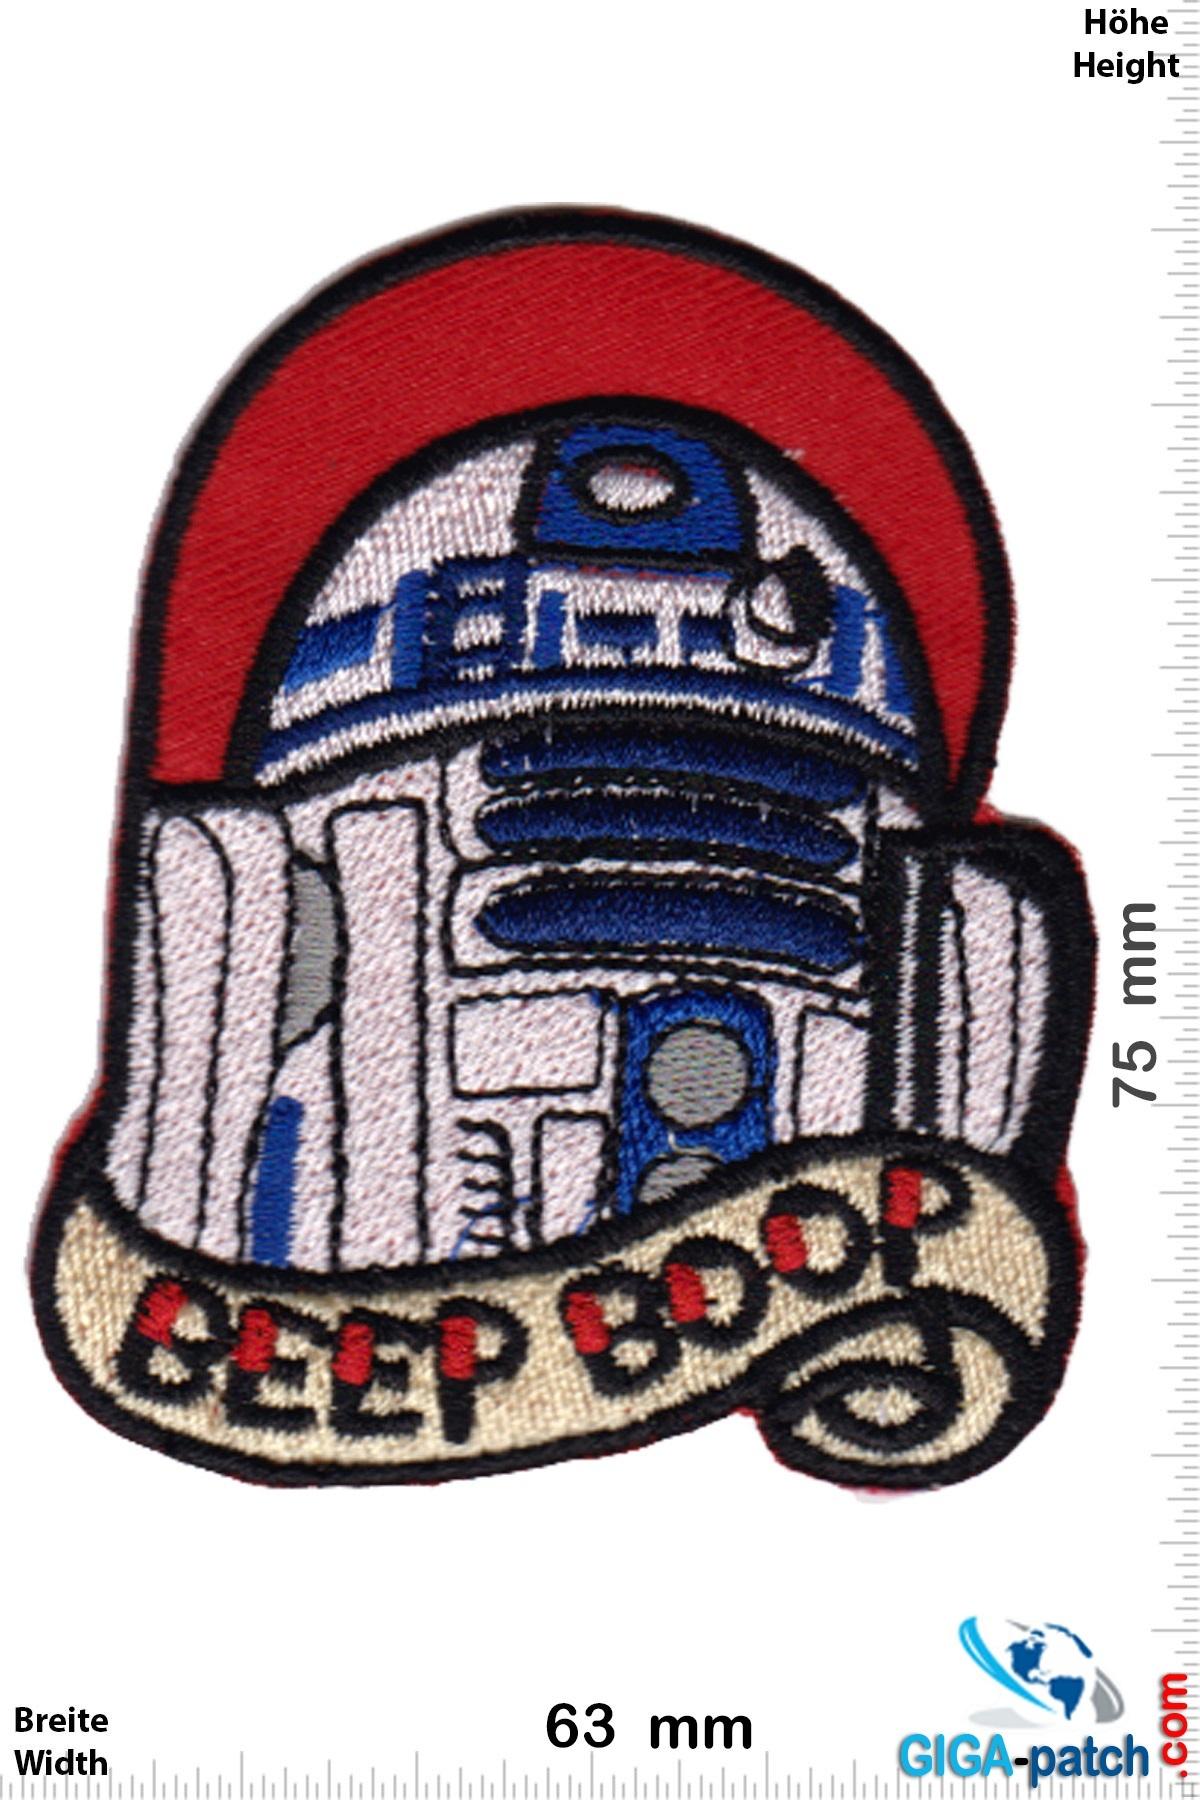 Star Wars Starwars - R2-D2 - Artoo-Detoo - Beep Boop